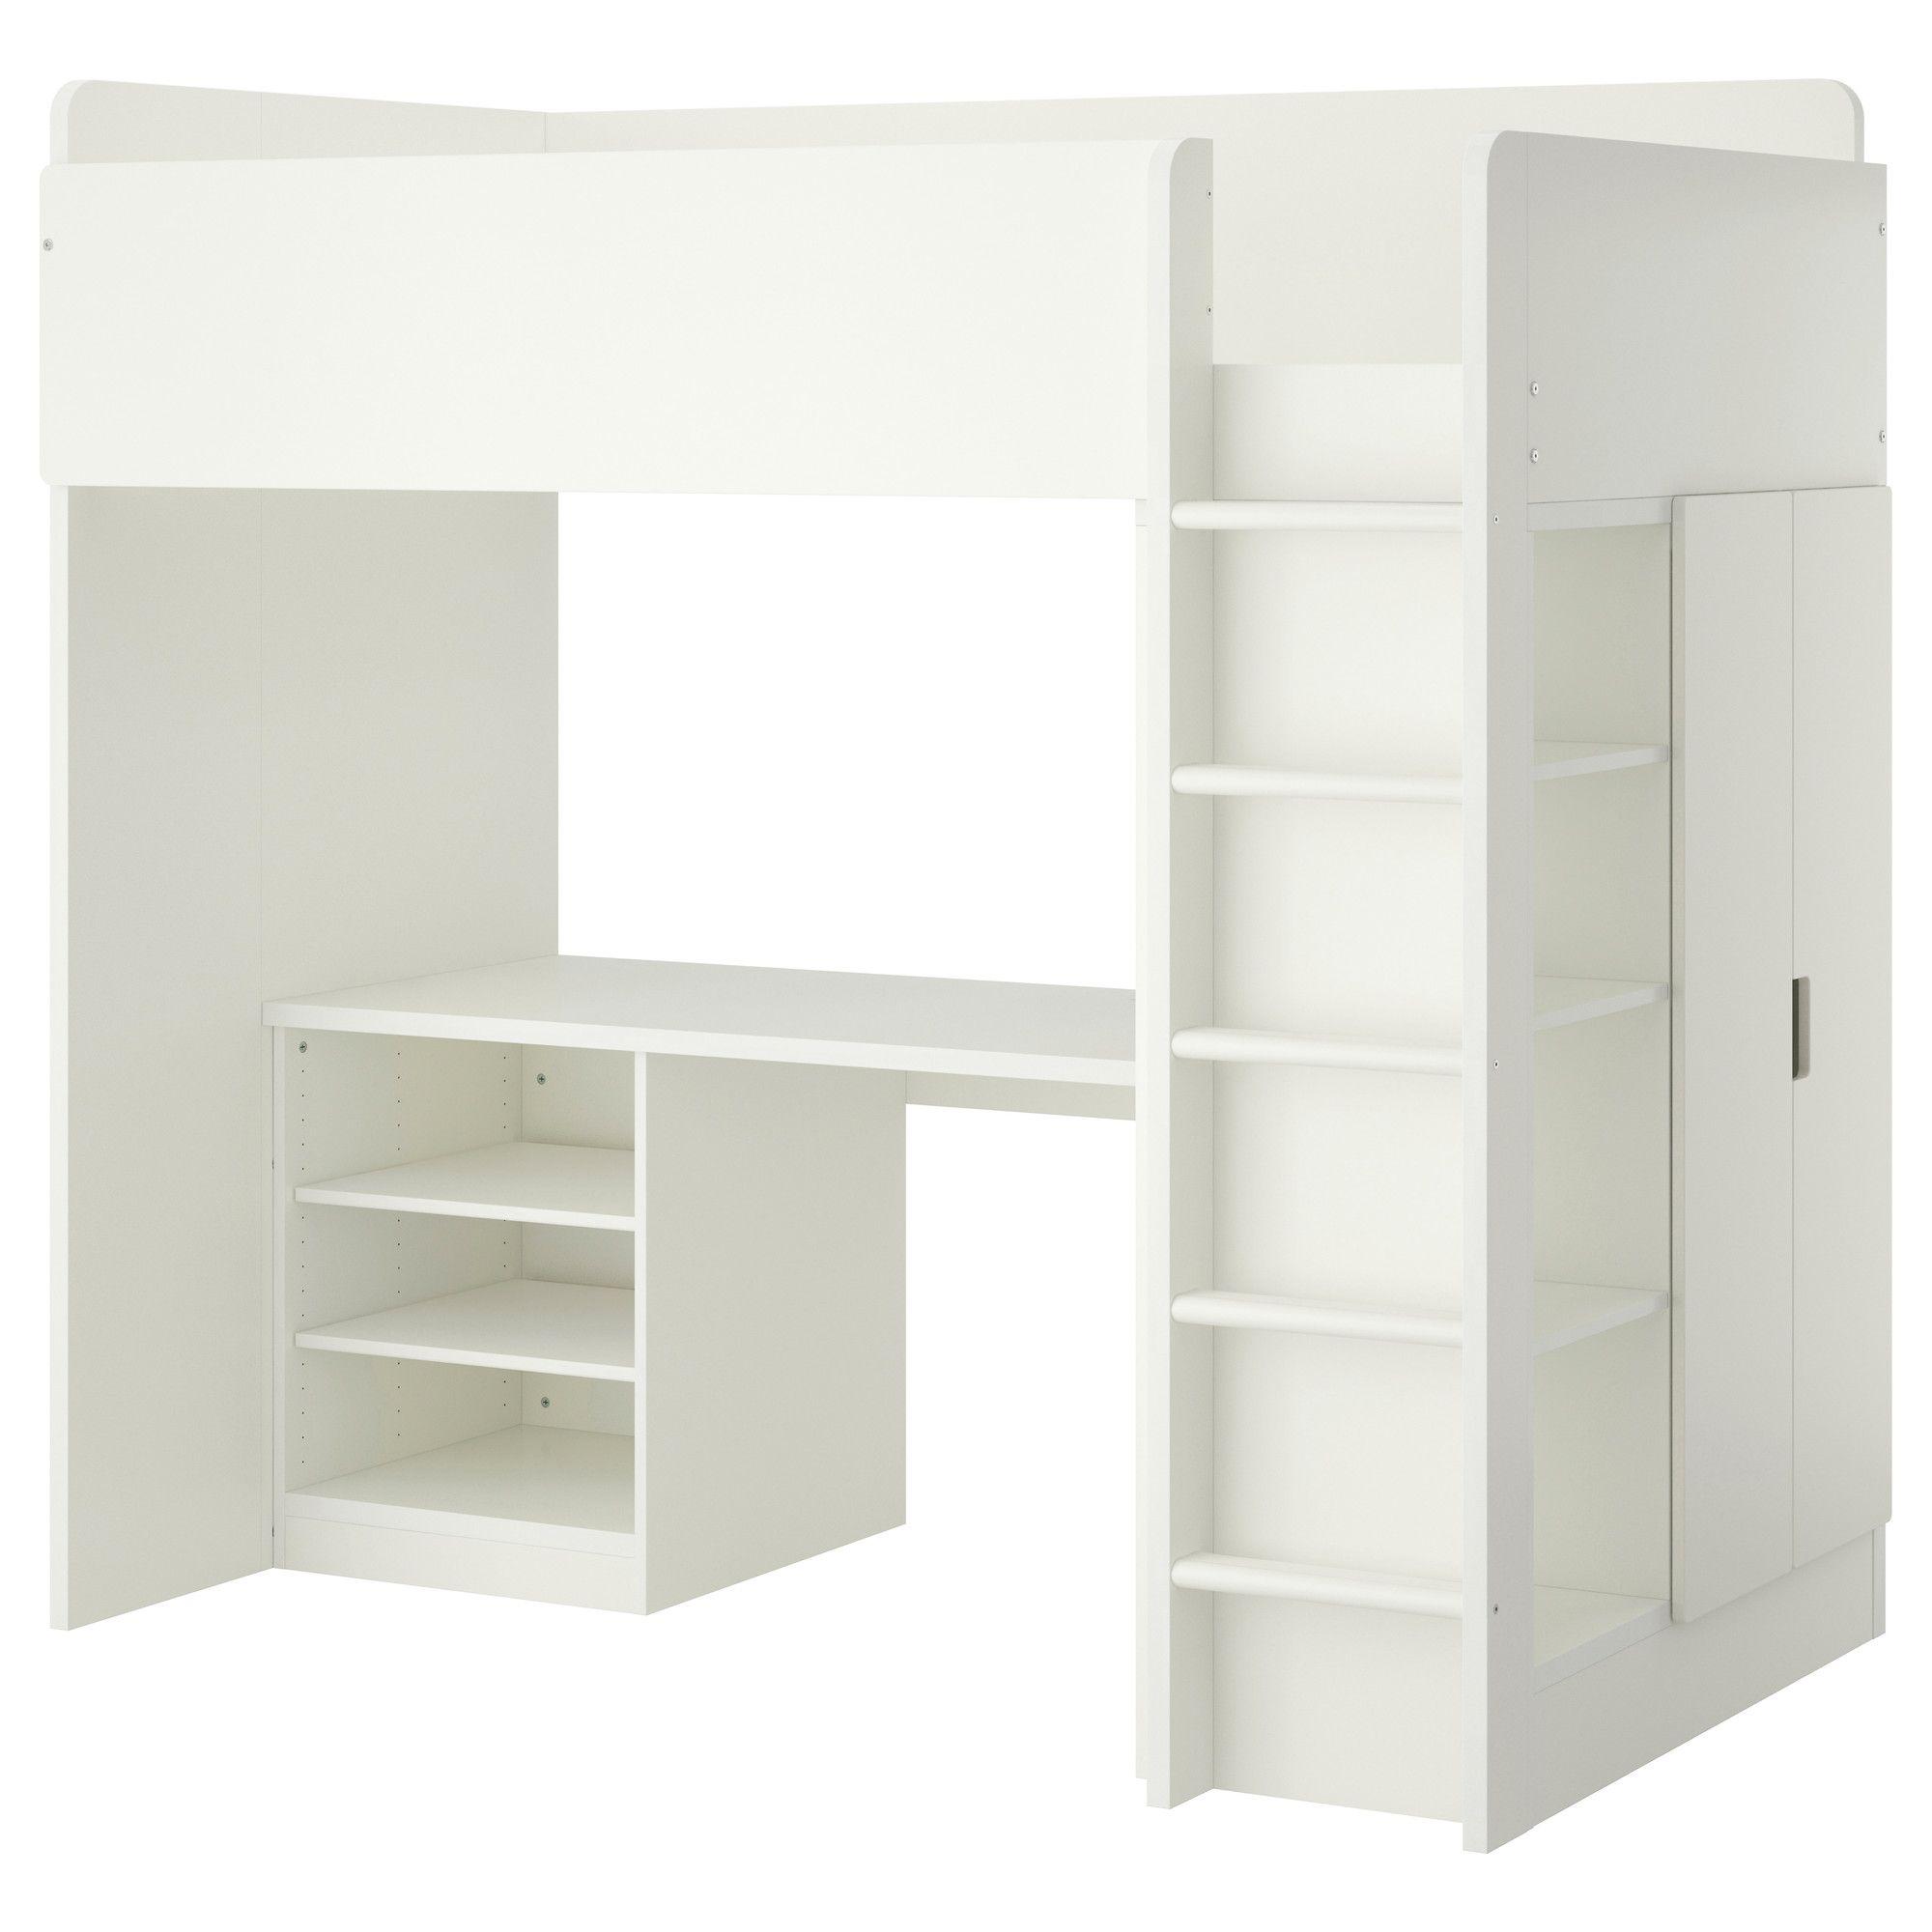 Charmant STUVA Loft Bed With 2 Shelves/2 Doors   White   IKEA